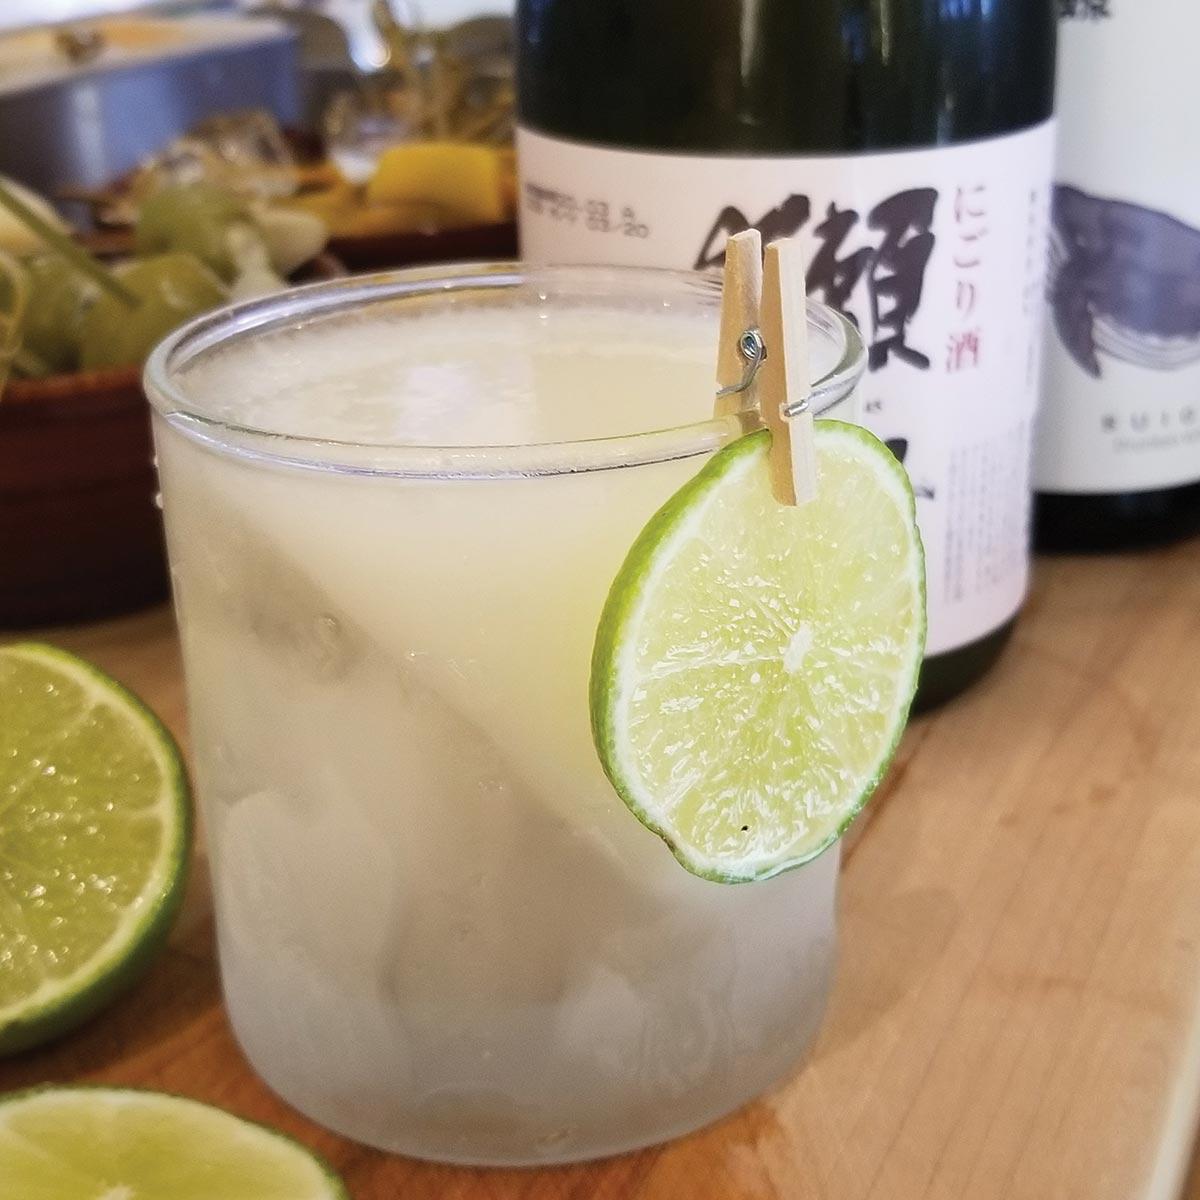 Serving Up: The Sake Gimlet at Arethusa al tavolo